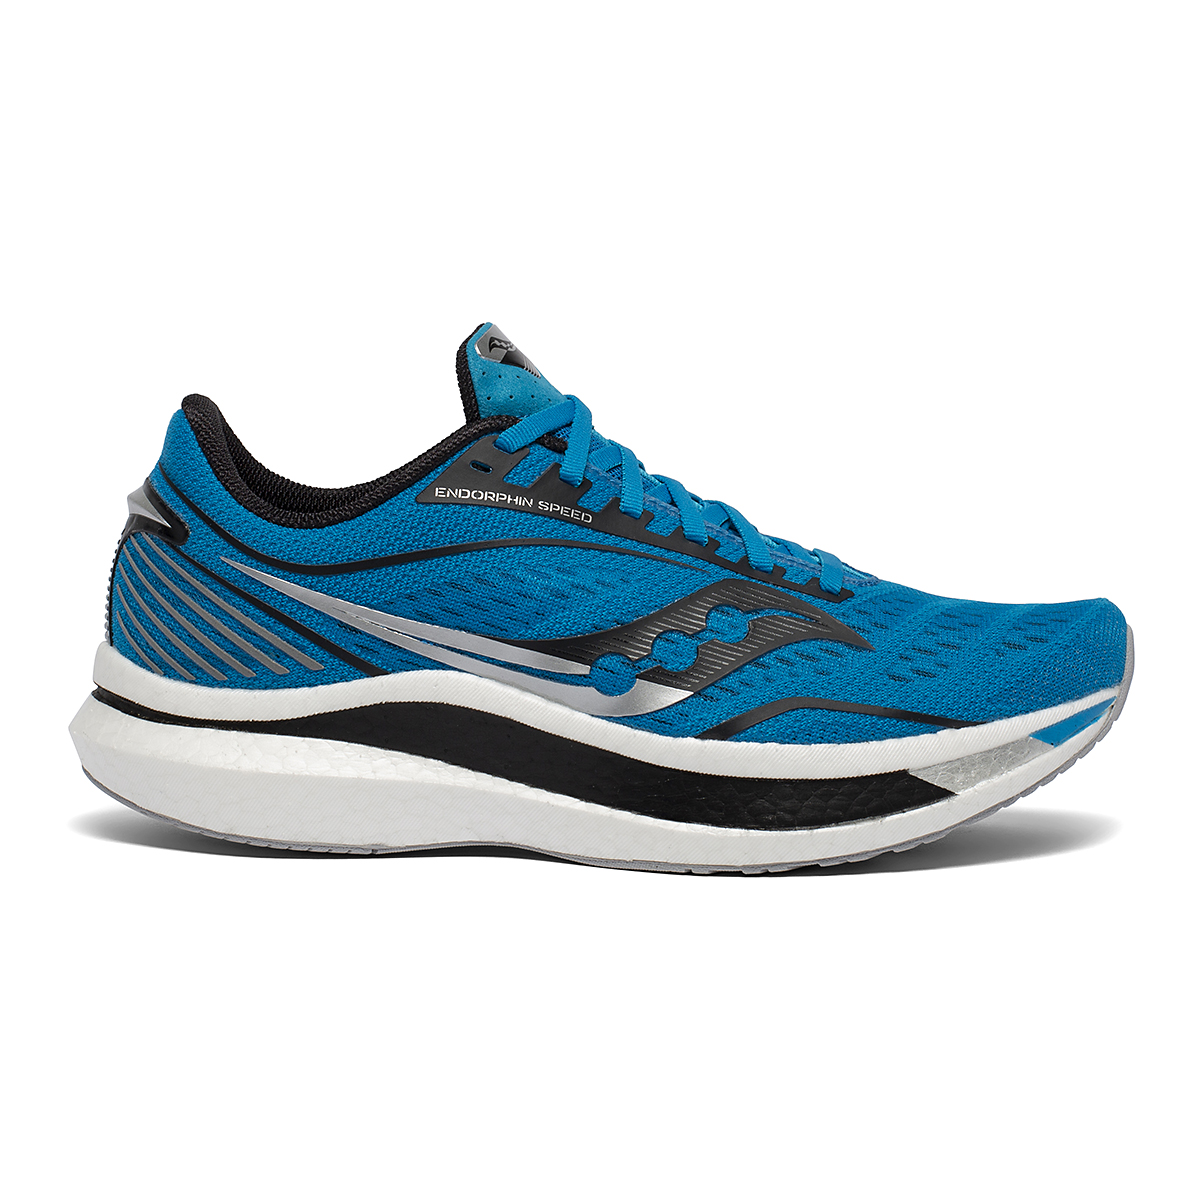 Men's Saucony Endorphin Speed Running Shoe - Color: Cobalt/Silver - Size: 8 - Width: Regular, Cobalt/Silver, large, image 1